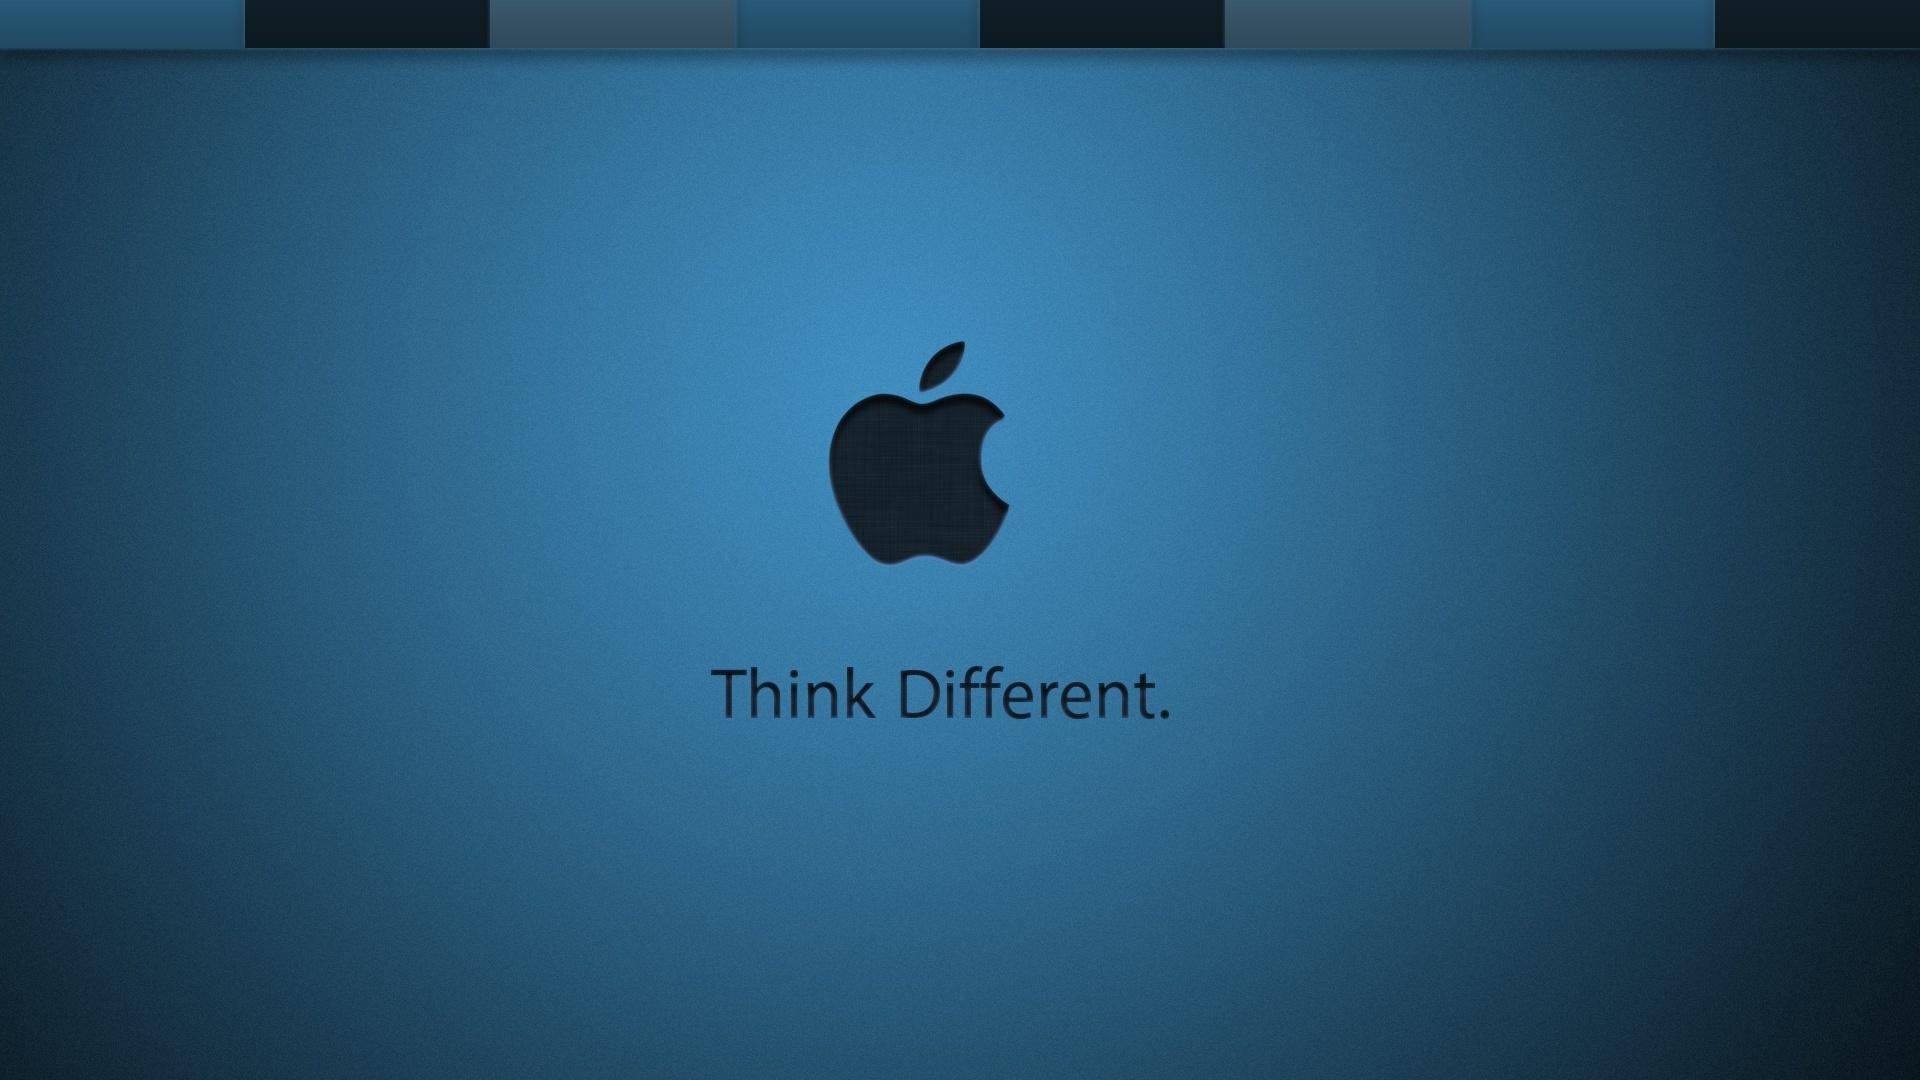 apple wallpaper pictures 1920x1080